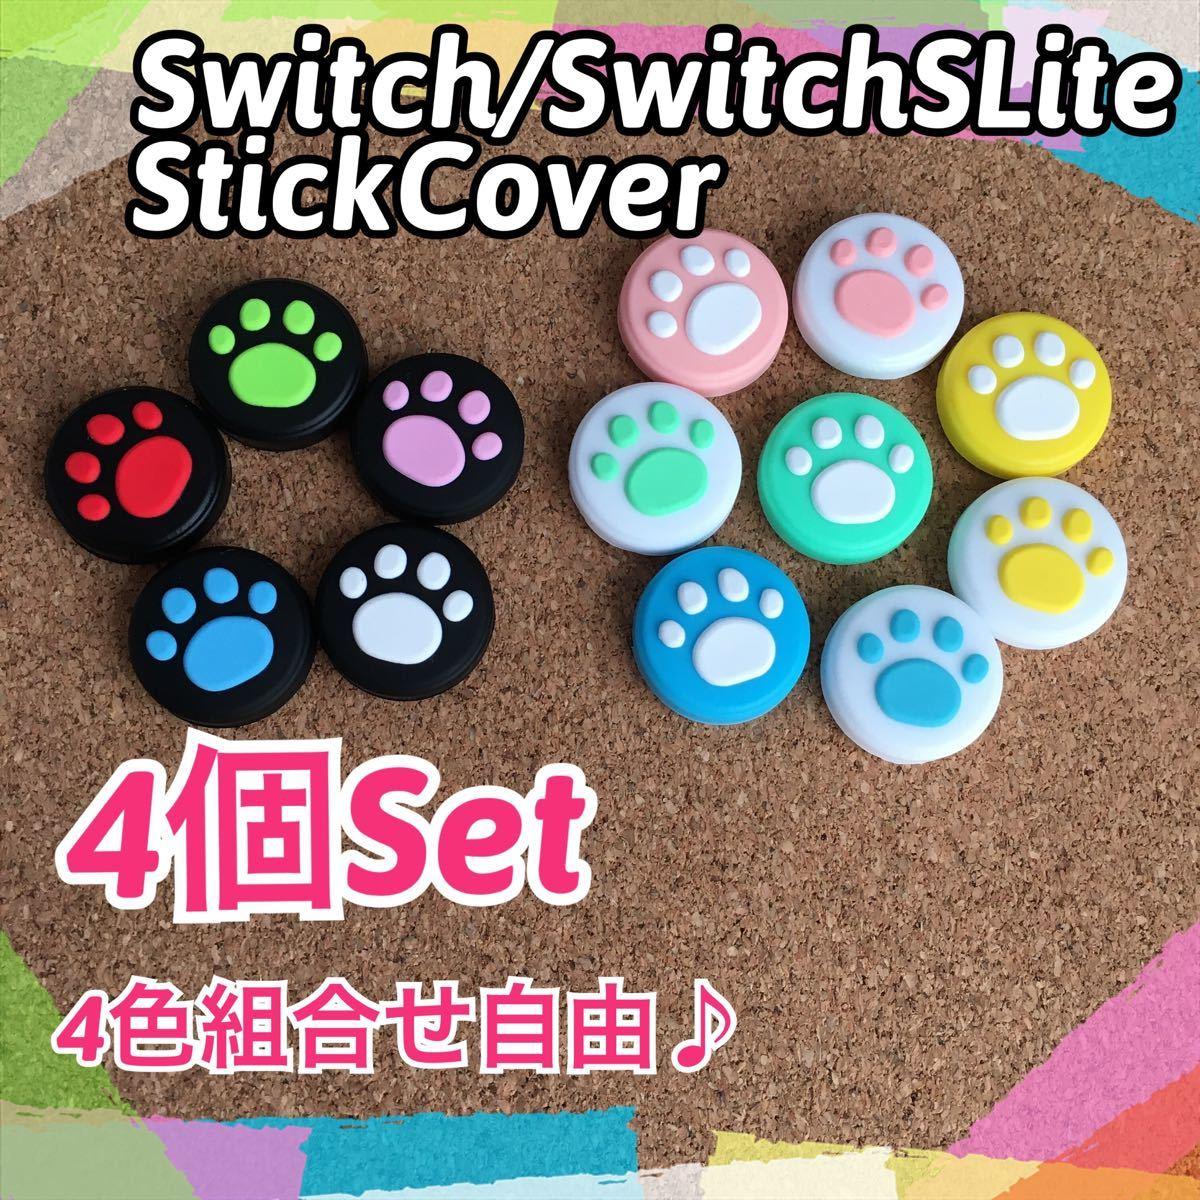 Switch スイッチ ジョイコン スティックカバー 肉球 4個セット